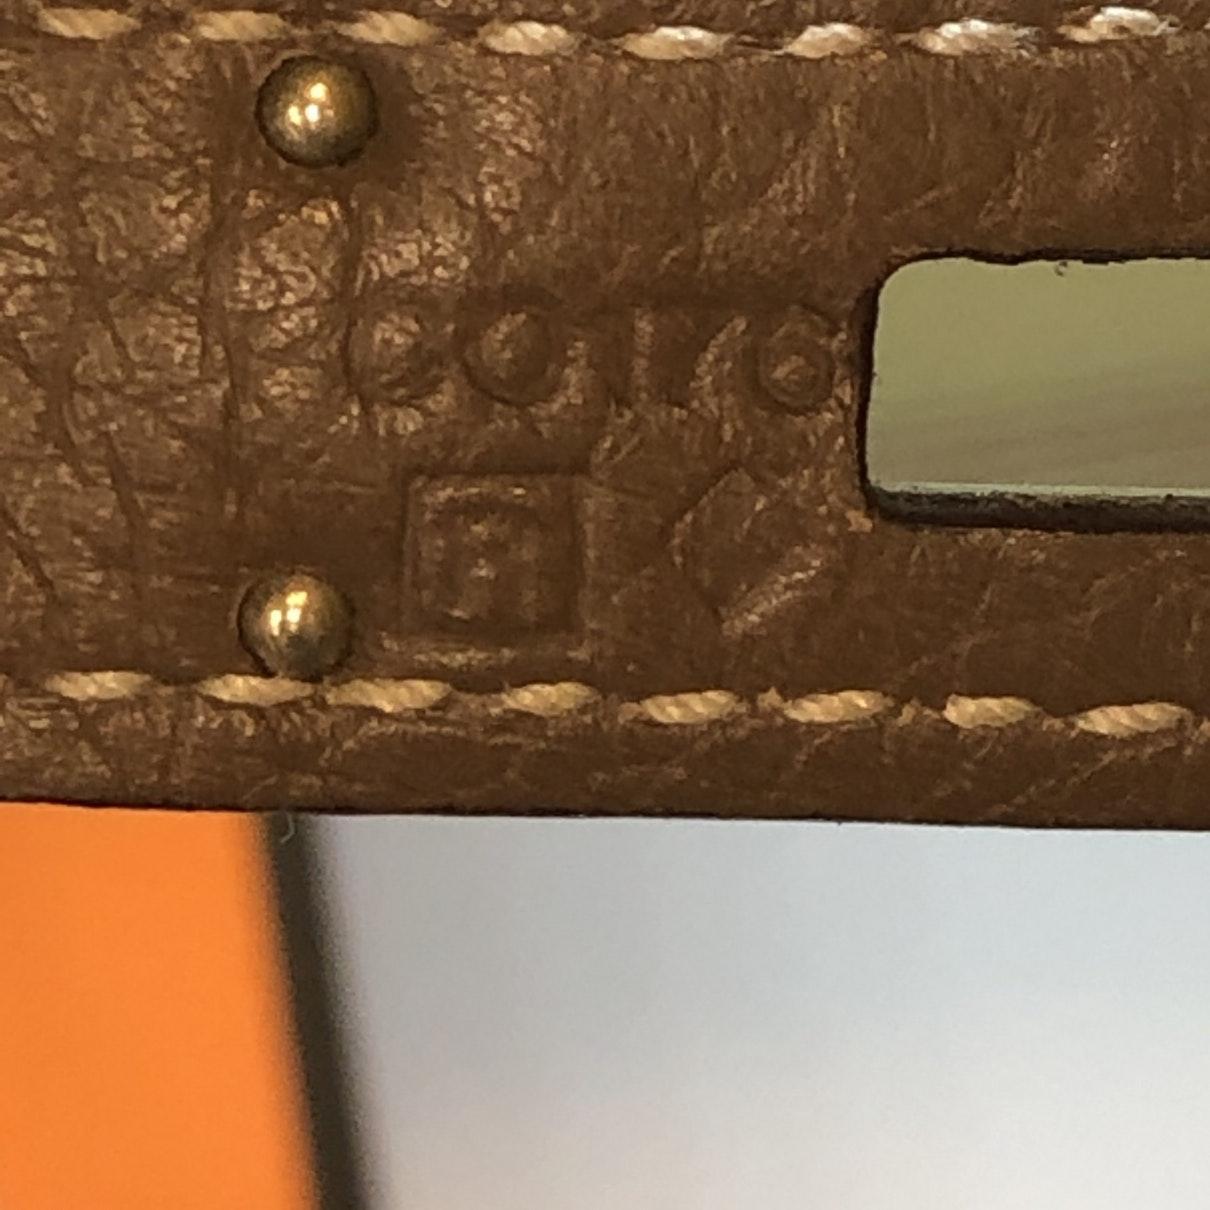 Sac à main Kelly 32 en Cuir Marron Cuir Hermès en coloris Marron yuXQ